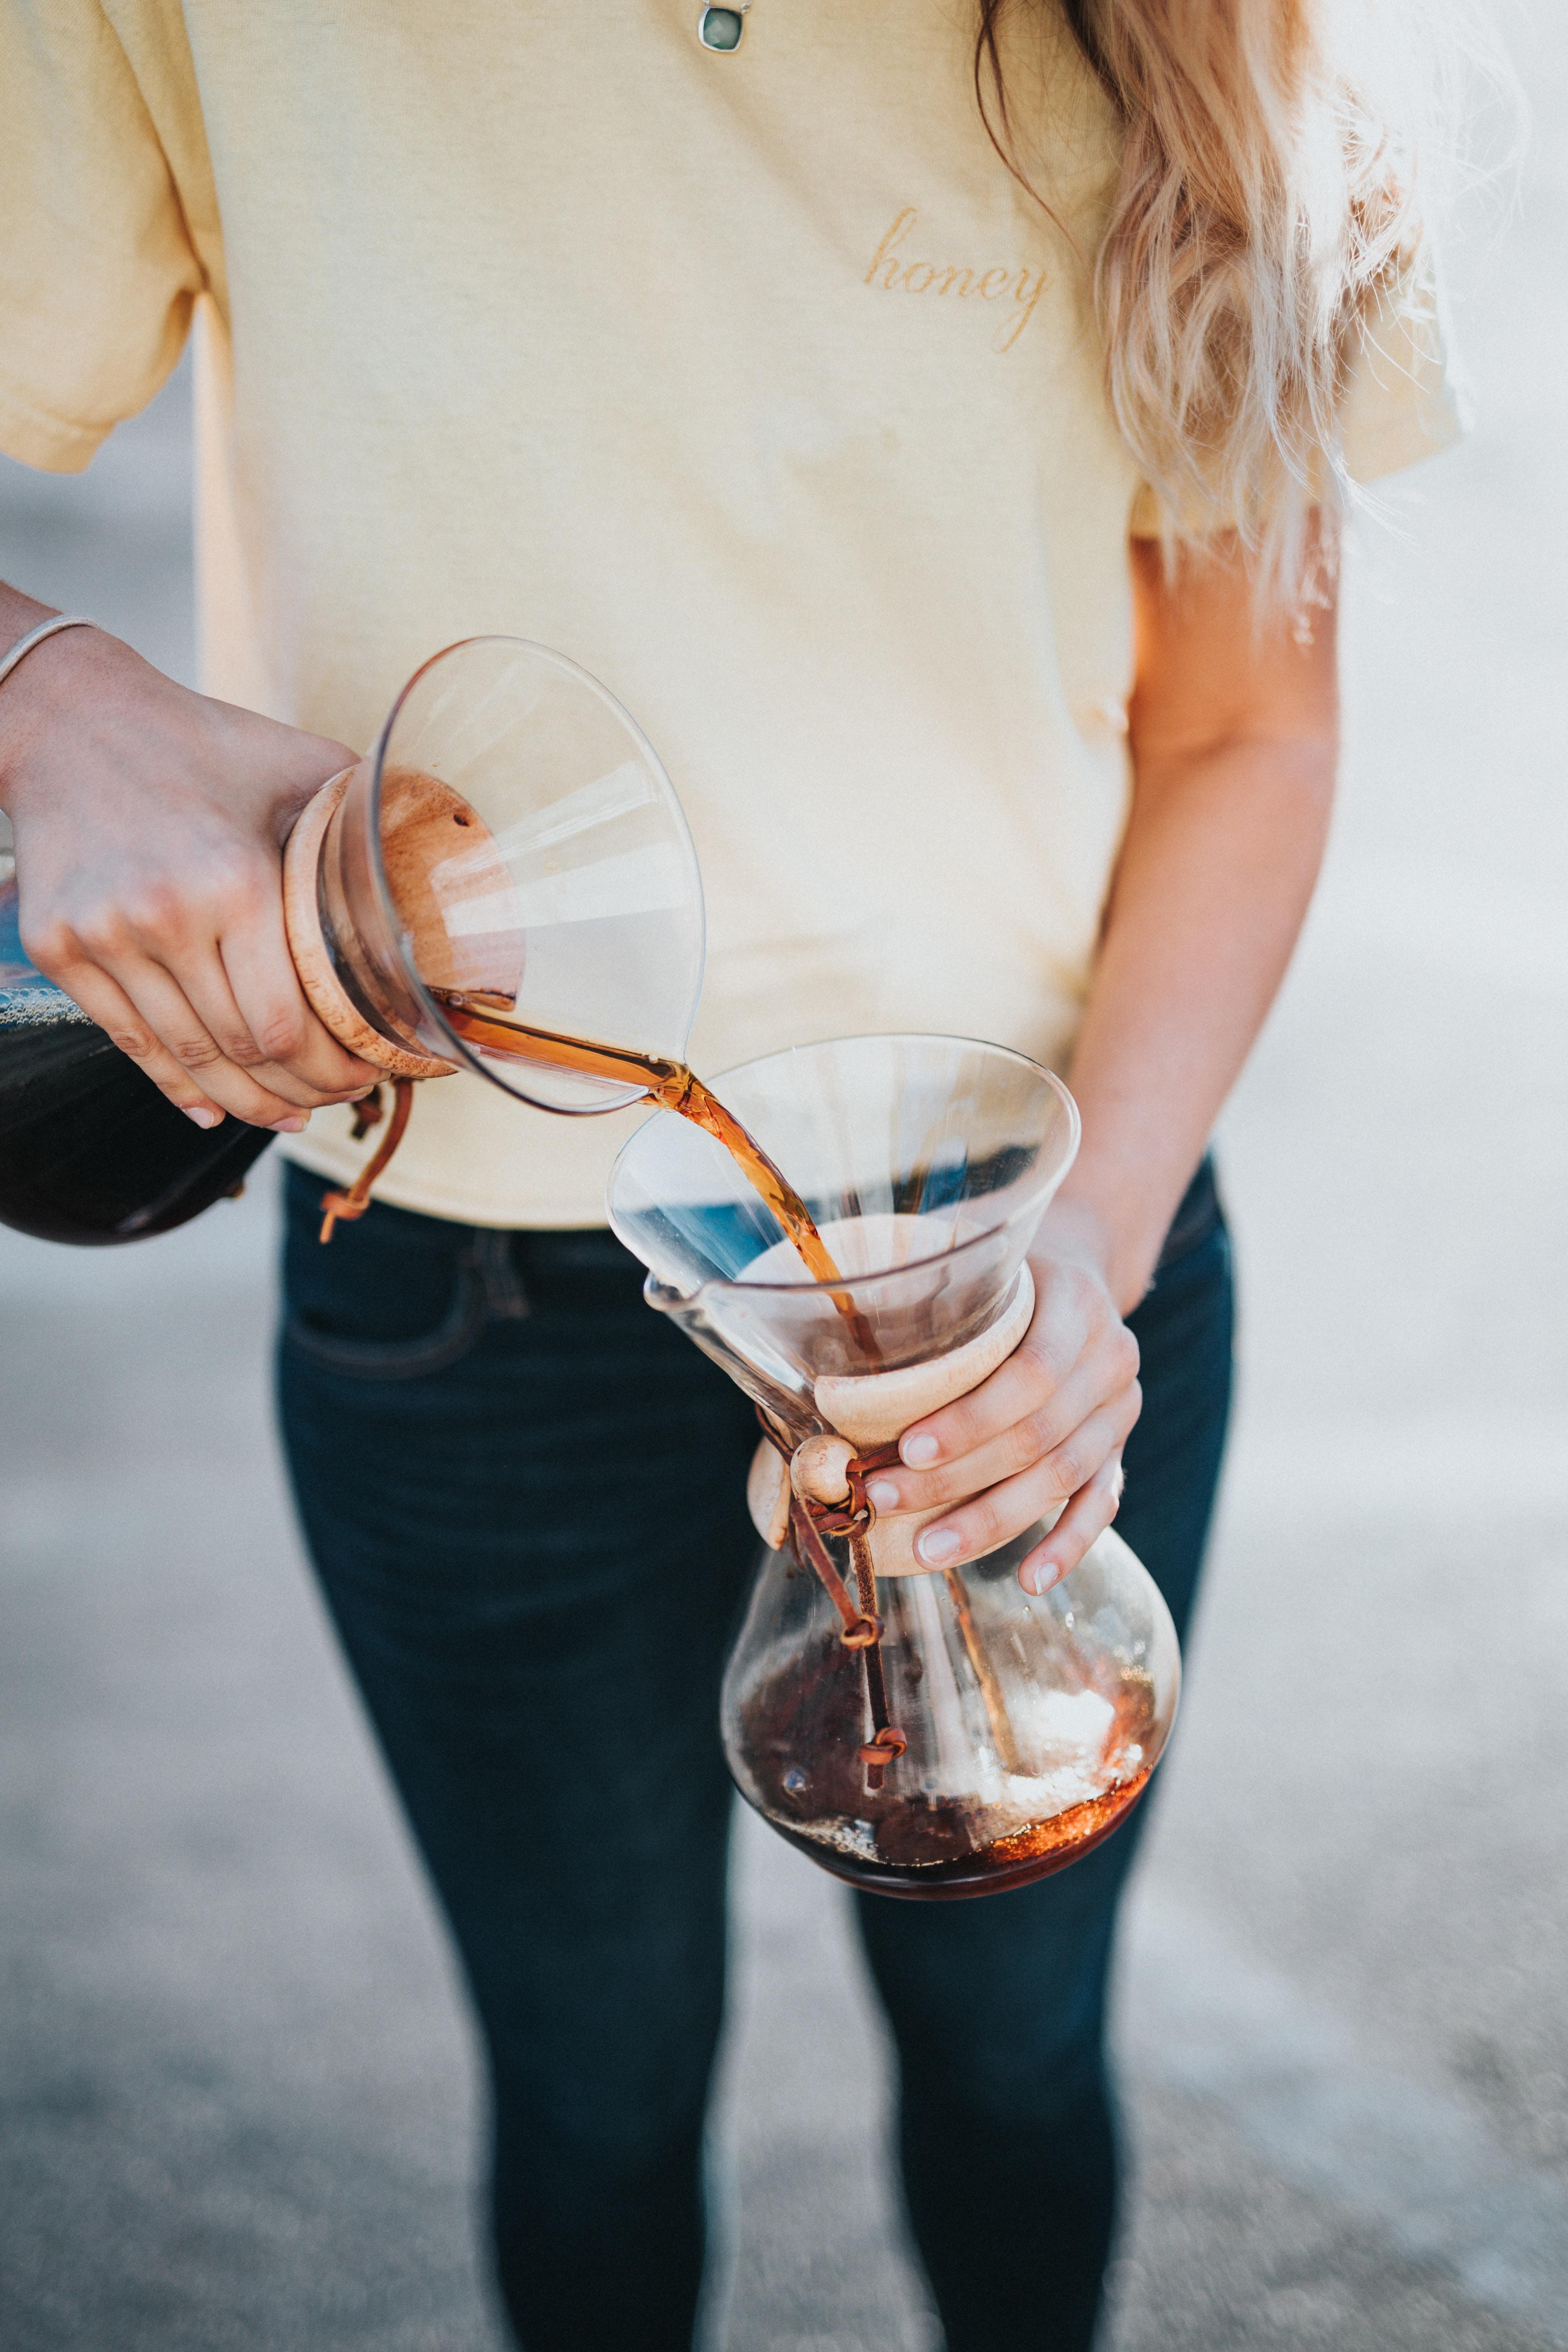 woman pouring liquid on jar